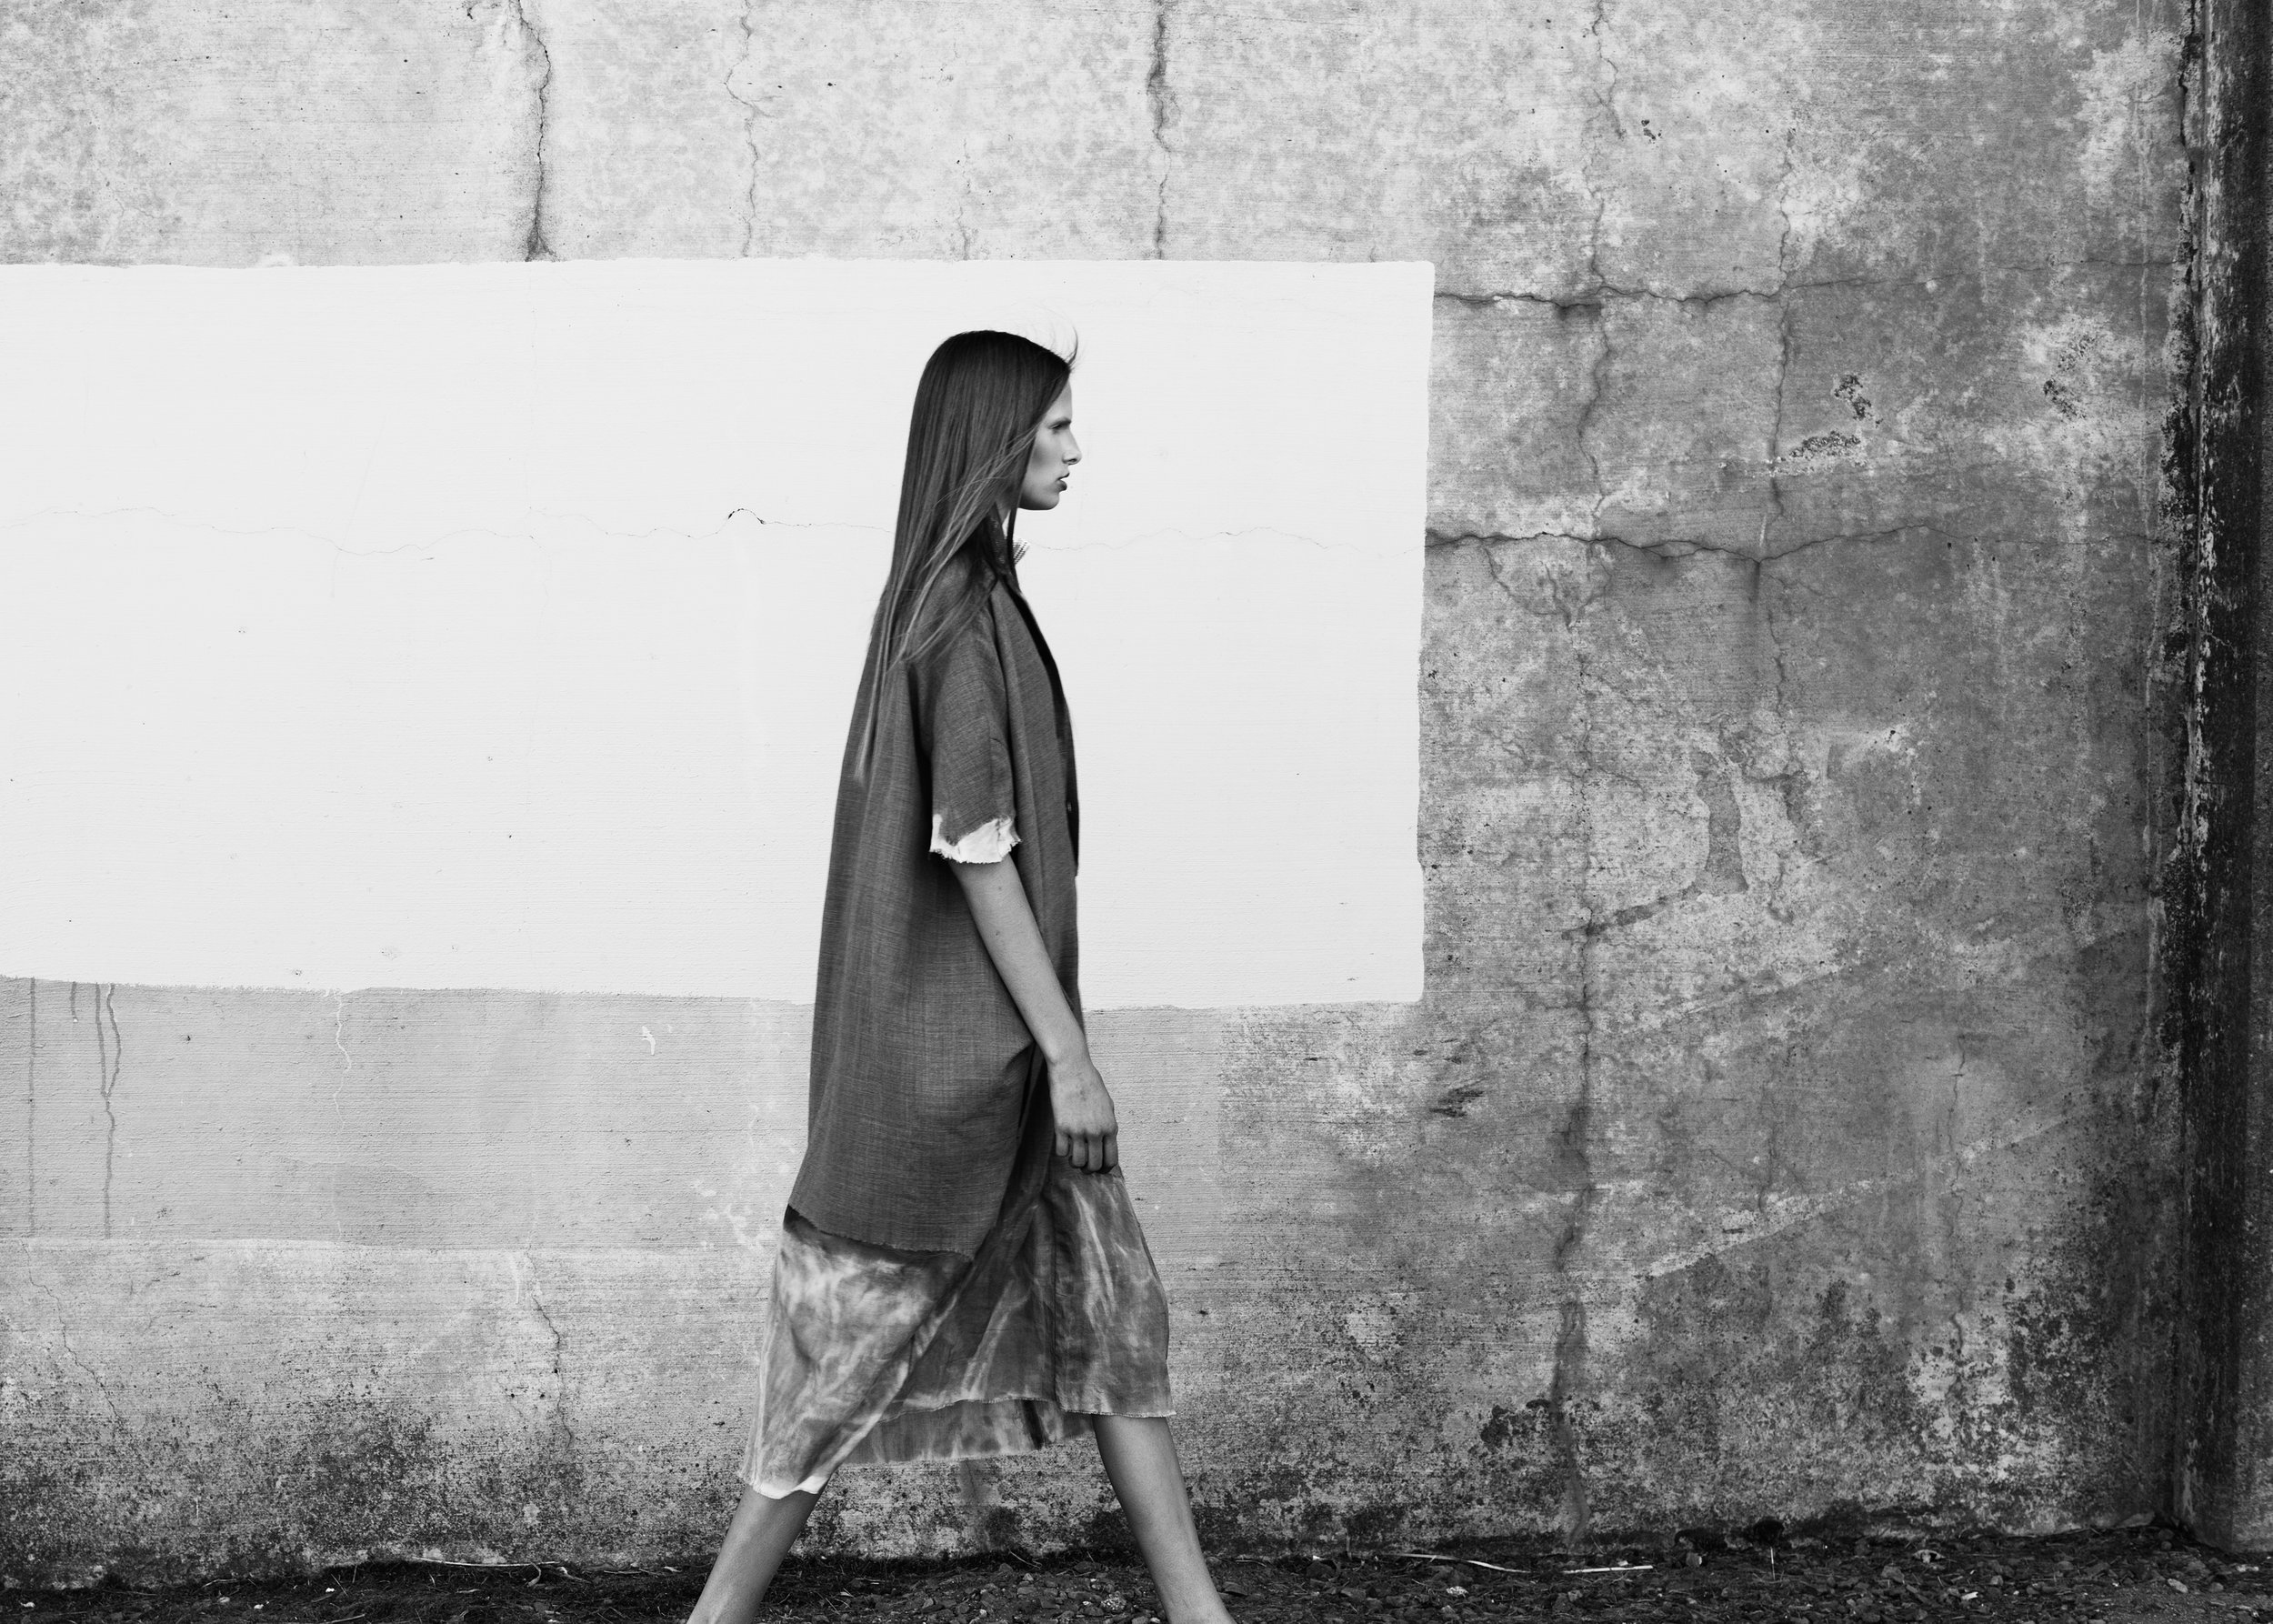 Dress by Gwen Shia-Yao Lai, MFA Fashion Design. Céline sweater, Saks Fifth Avenue. Shoes, stylist's own.